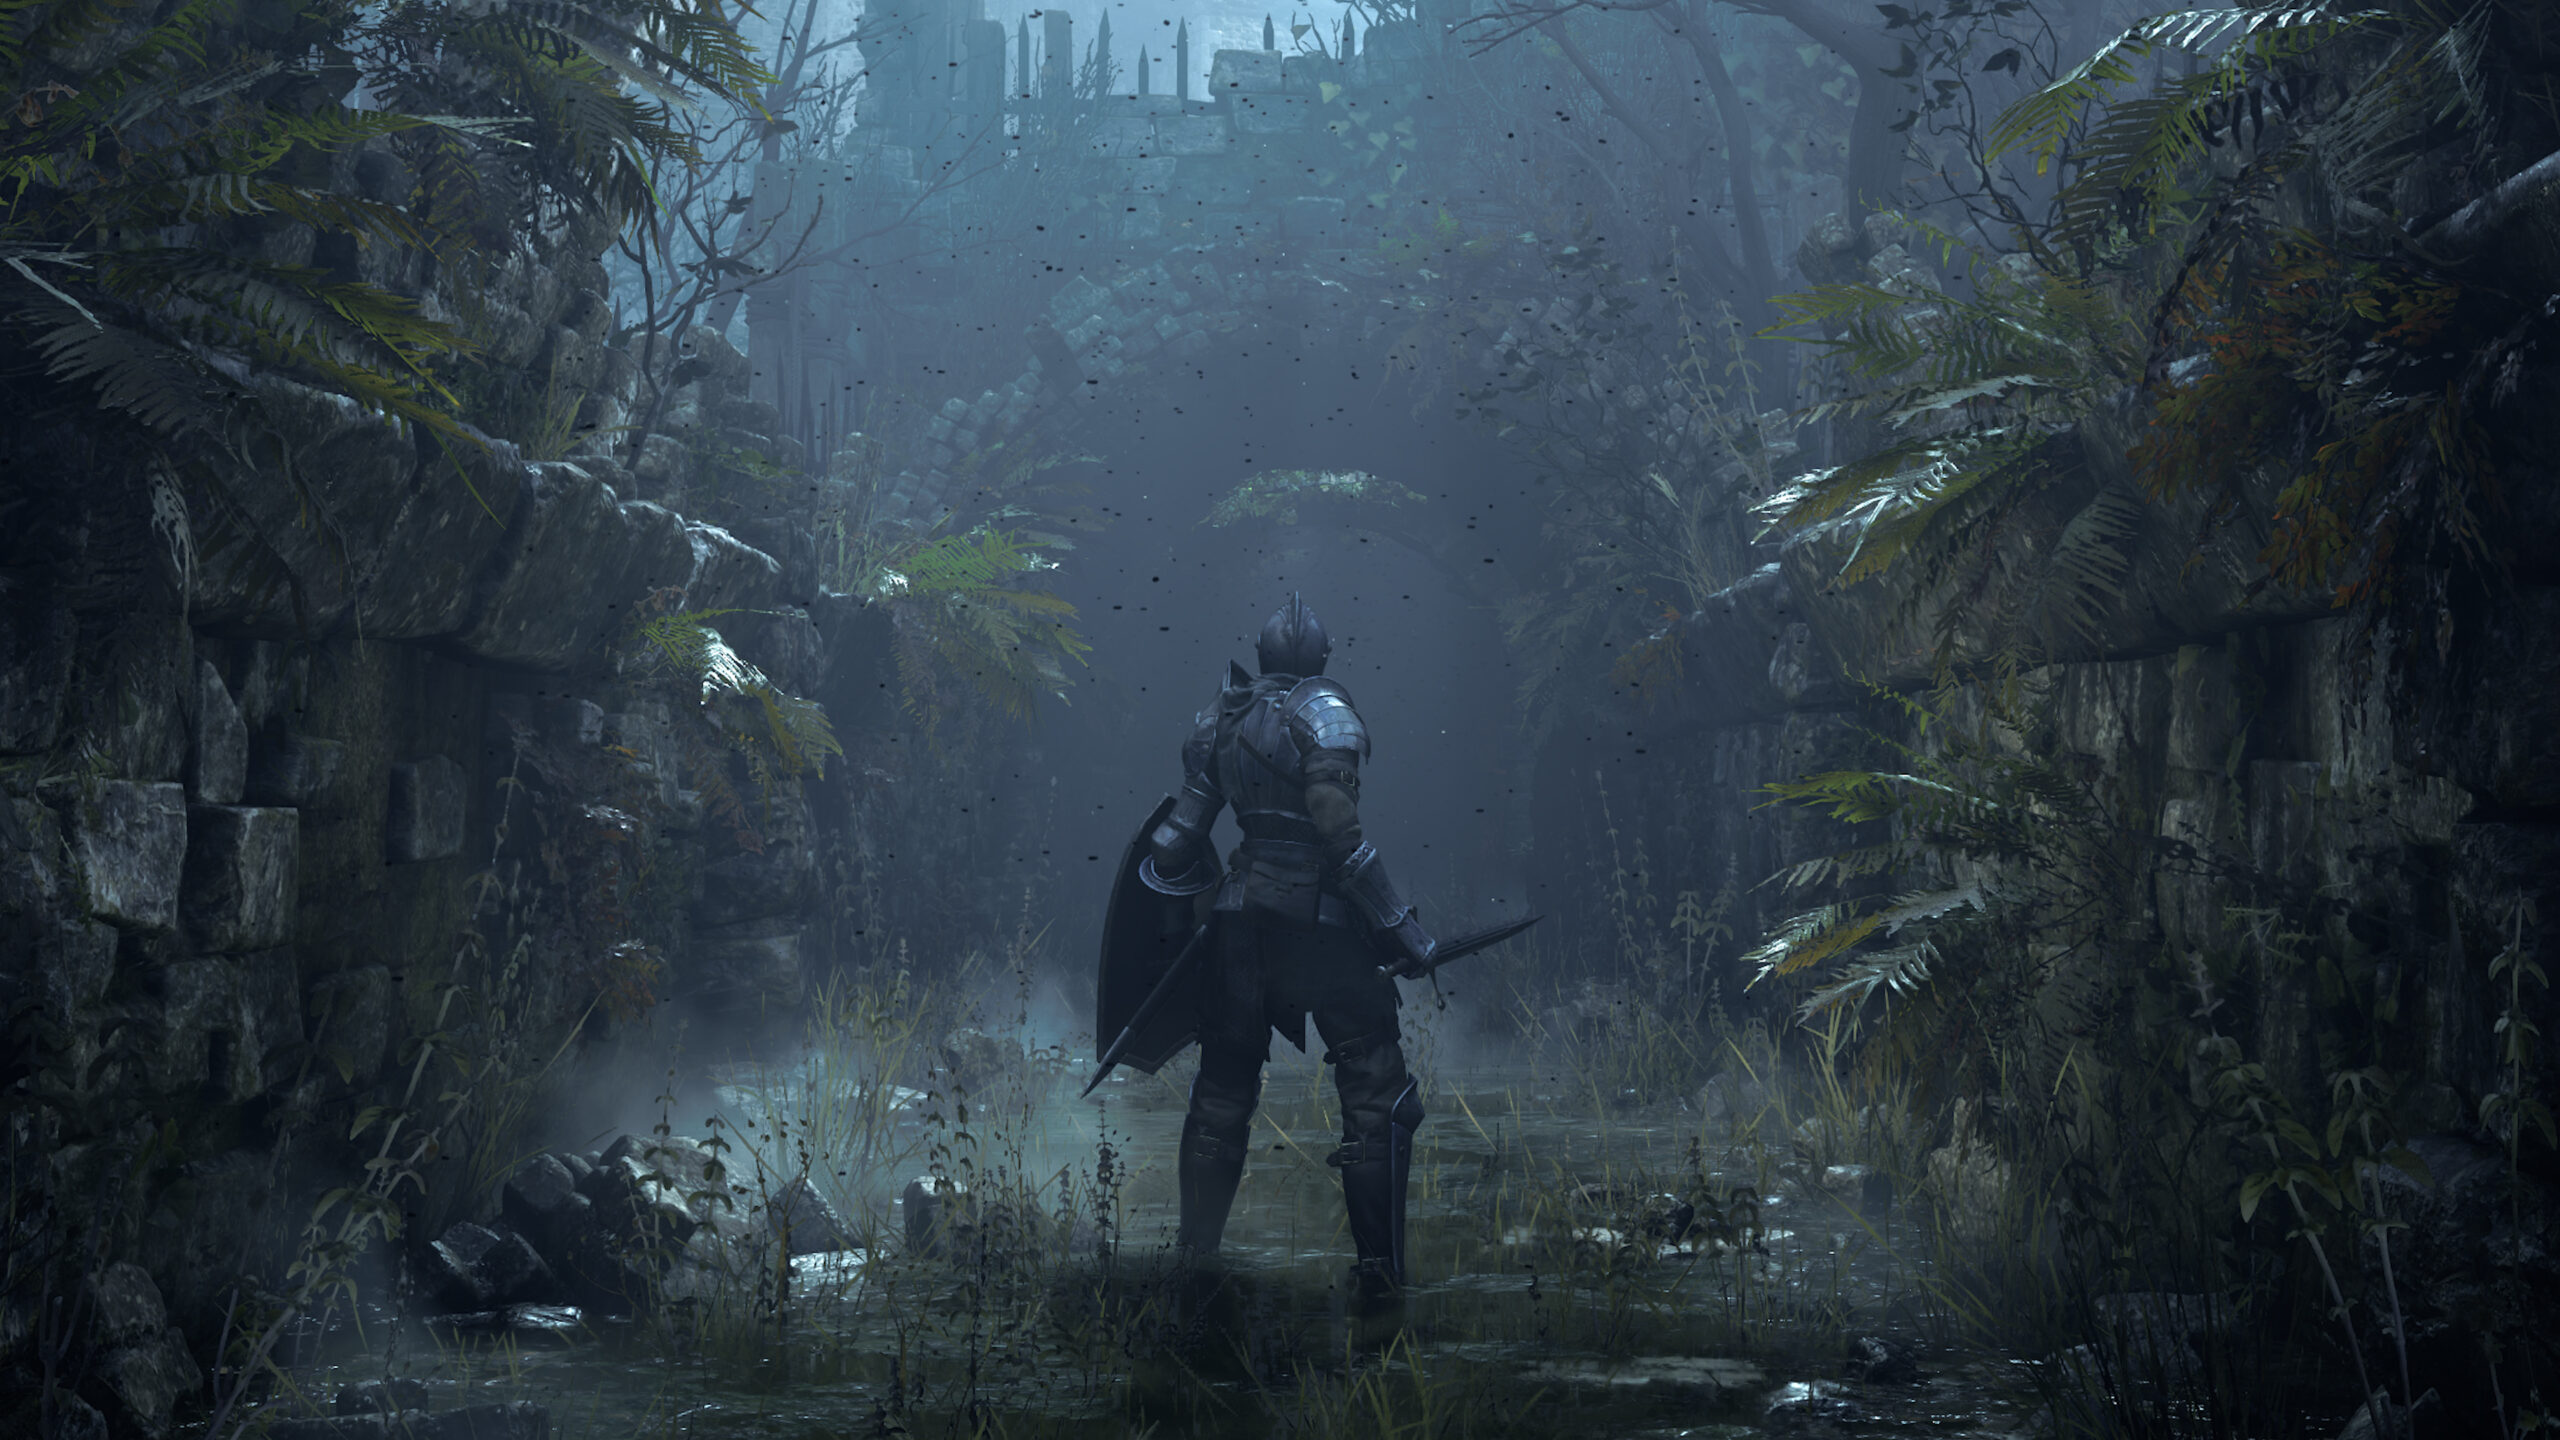 Lo State of Play di Sony a sorpresa a tema Demon's Souls Remake